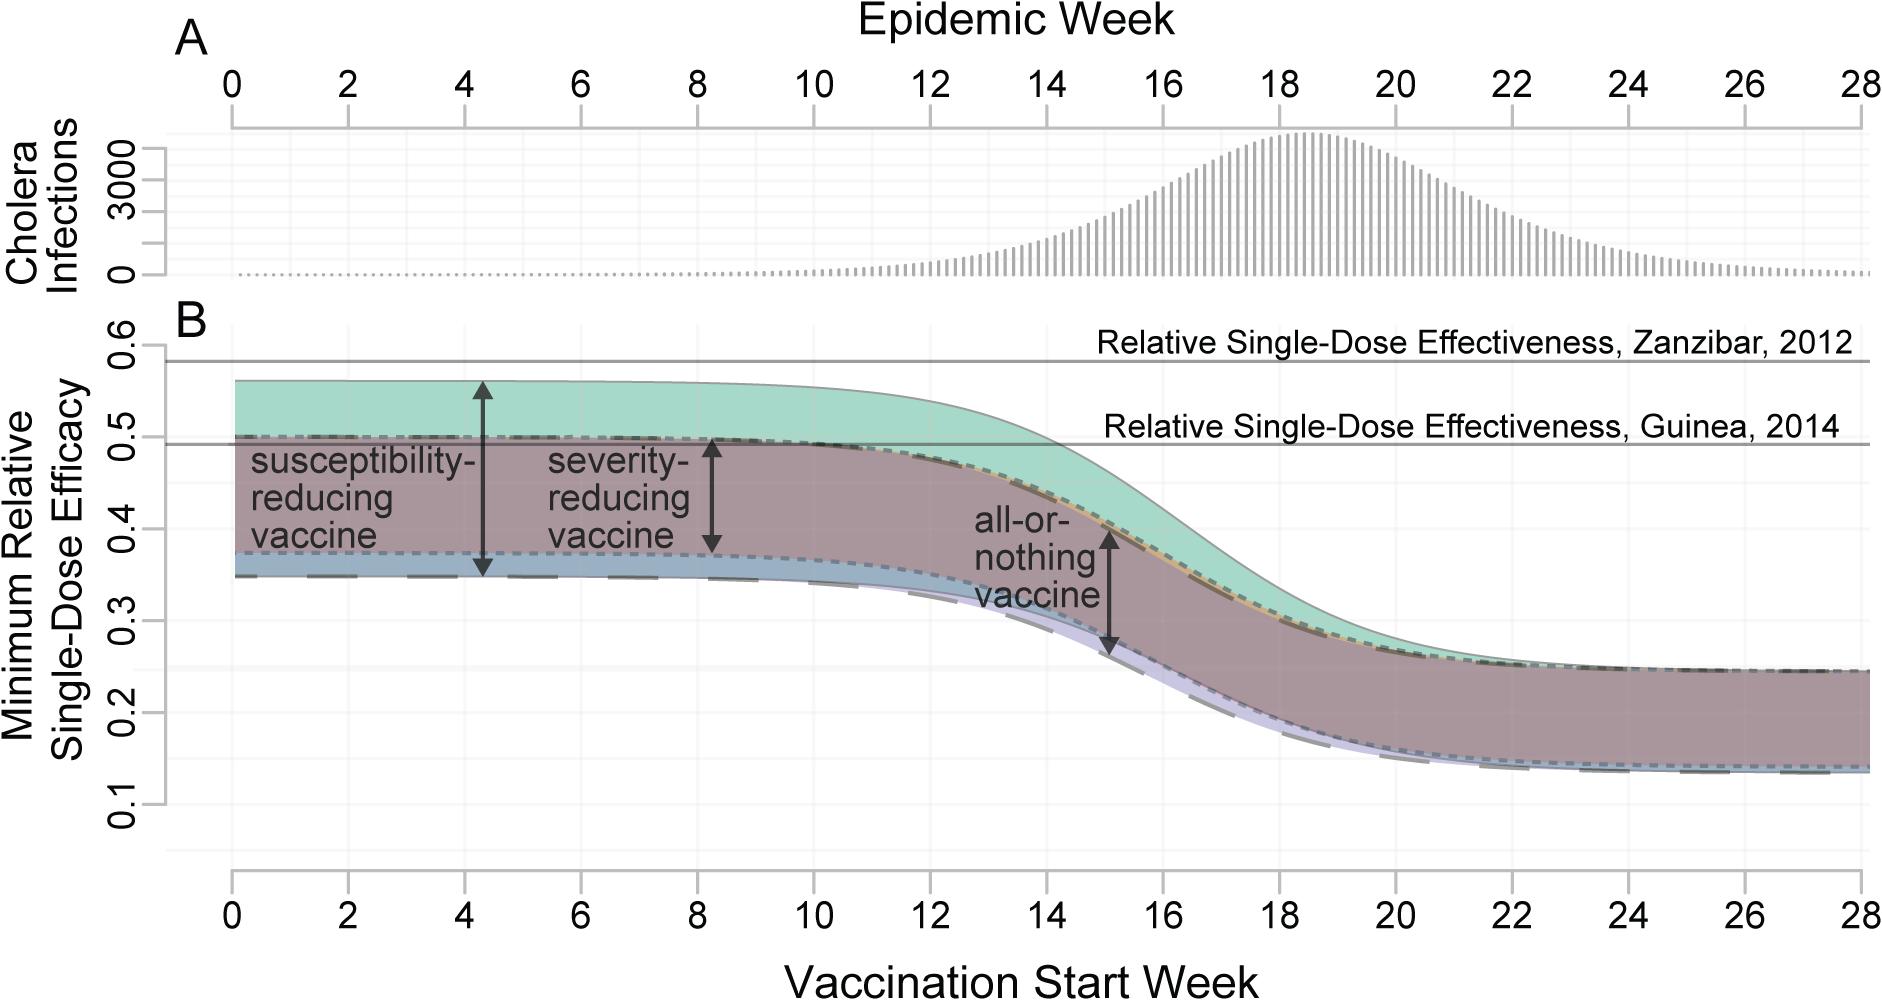 Minimum relative single-dose efficacy for oral cholera vaccine.